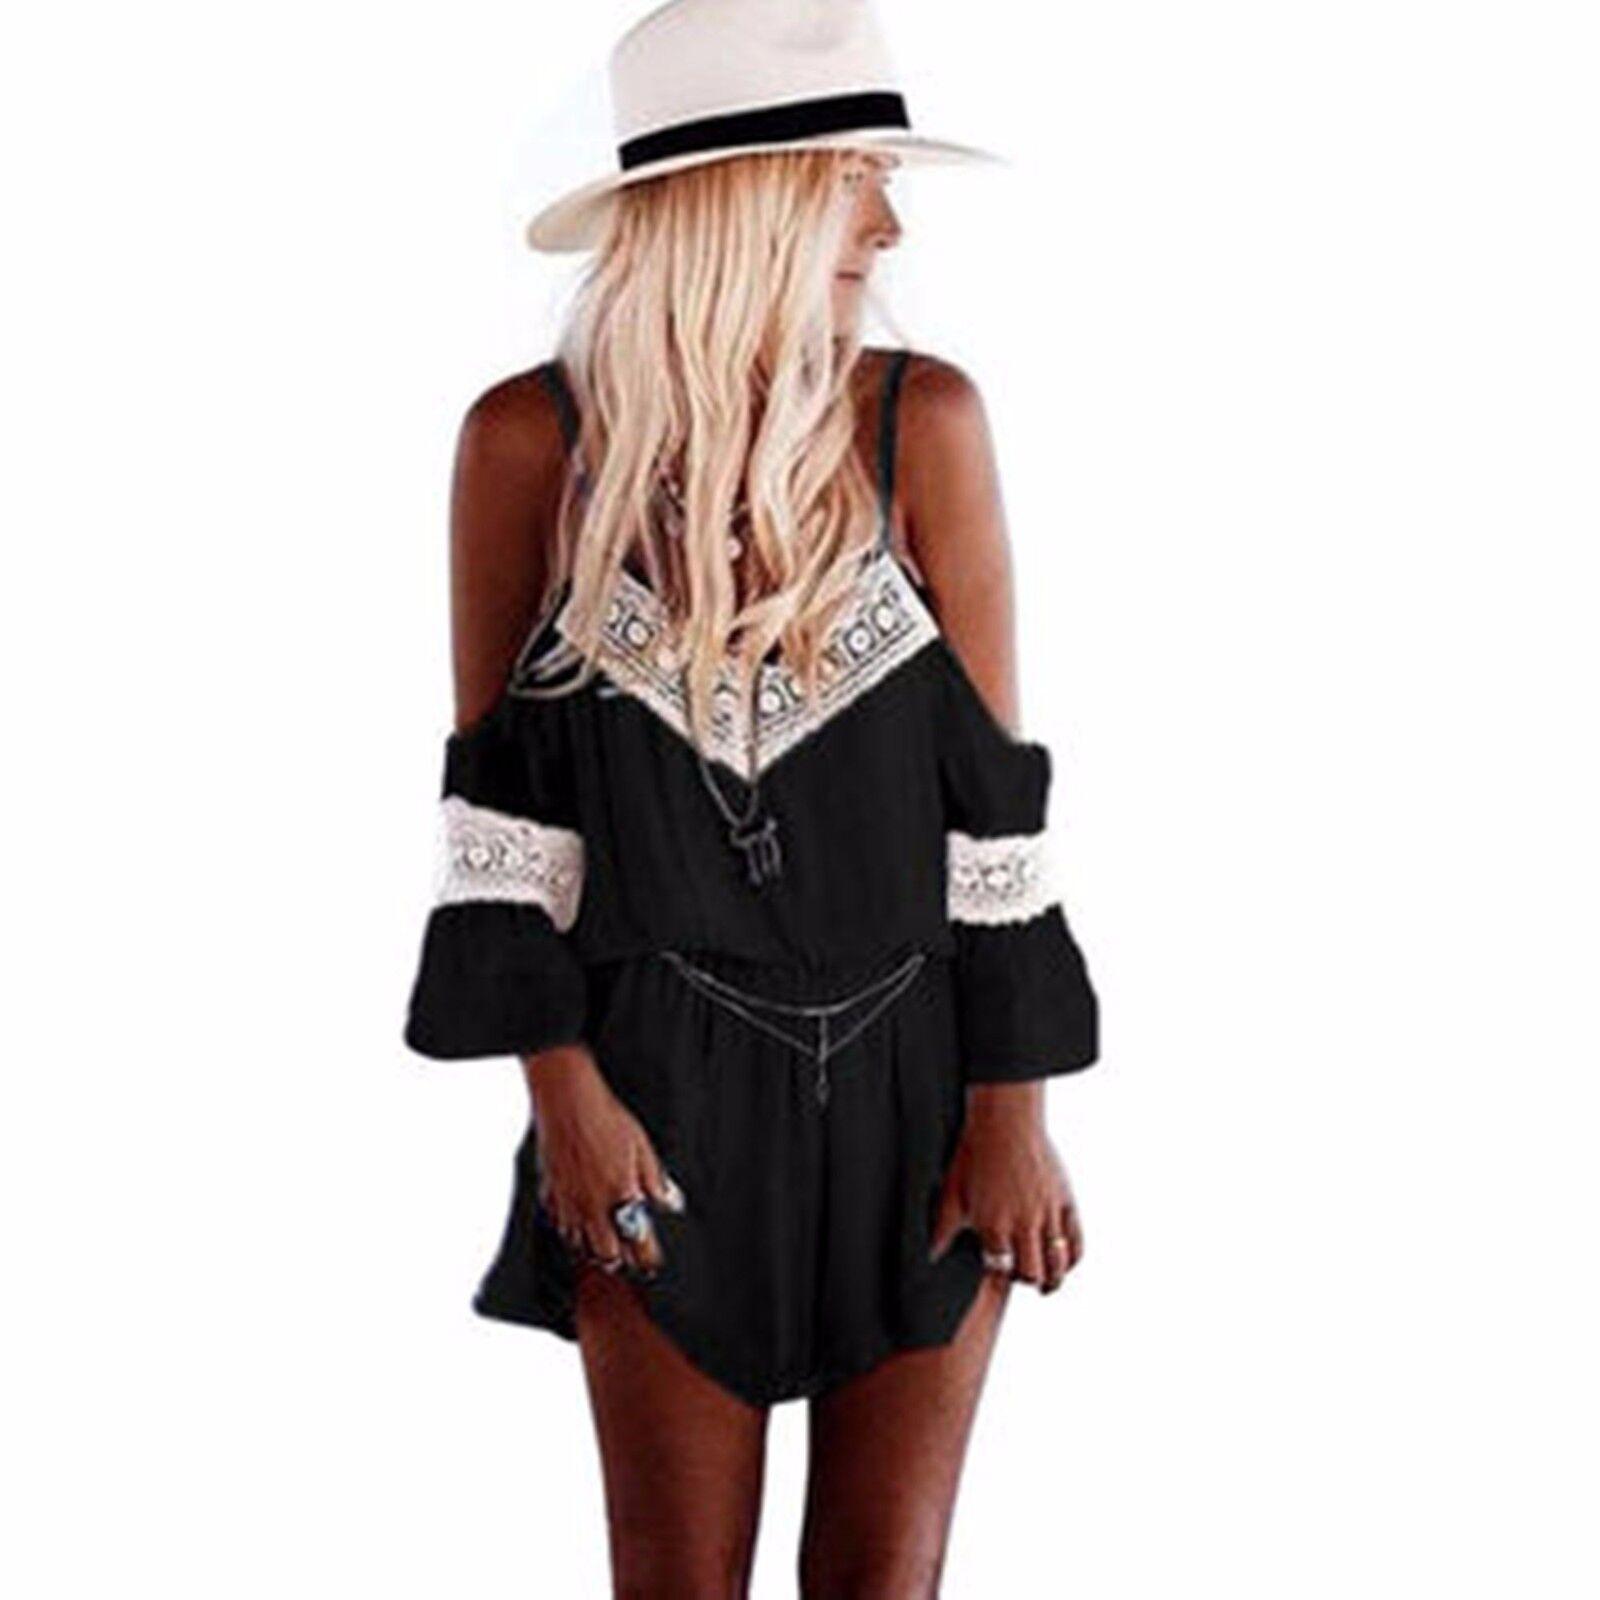 39c2a189fde Details about UK Summer Womens Holiday Mini Playsuit Ladies Jumpsuit Beach  Shorts Mini Dress